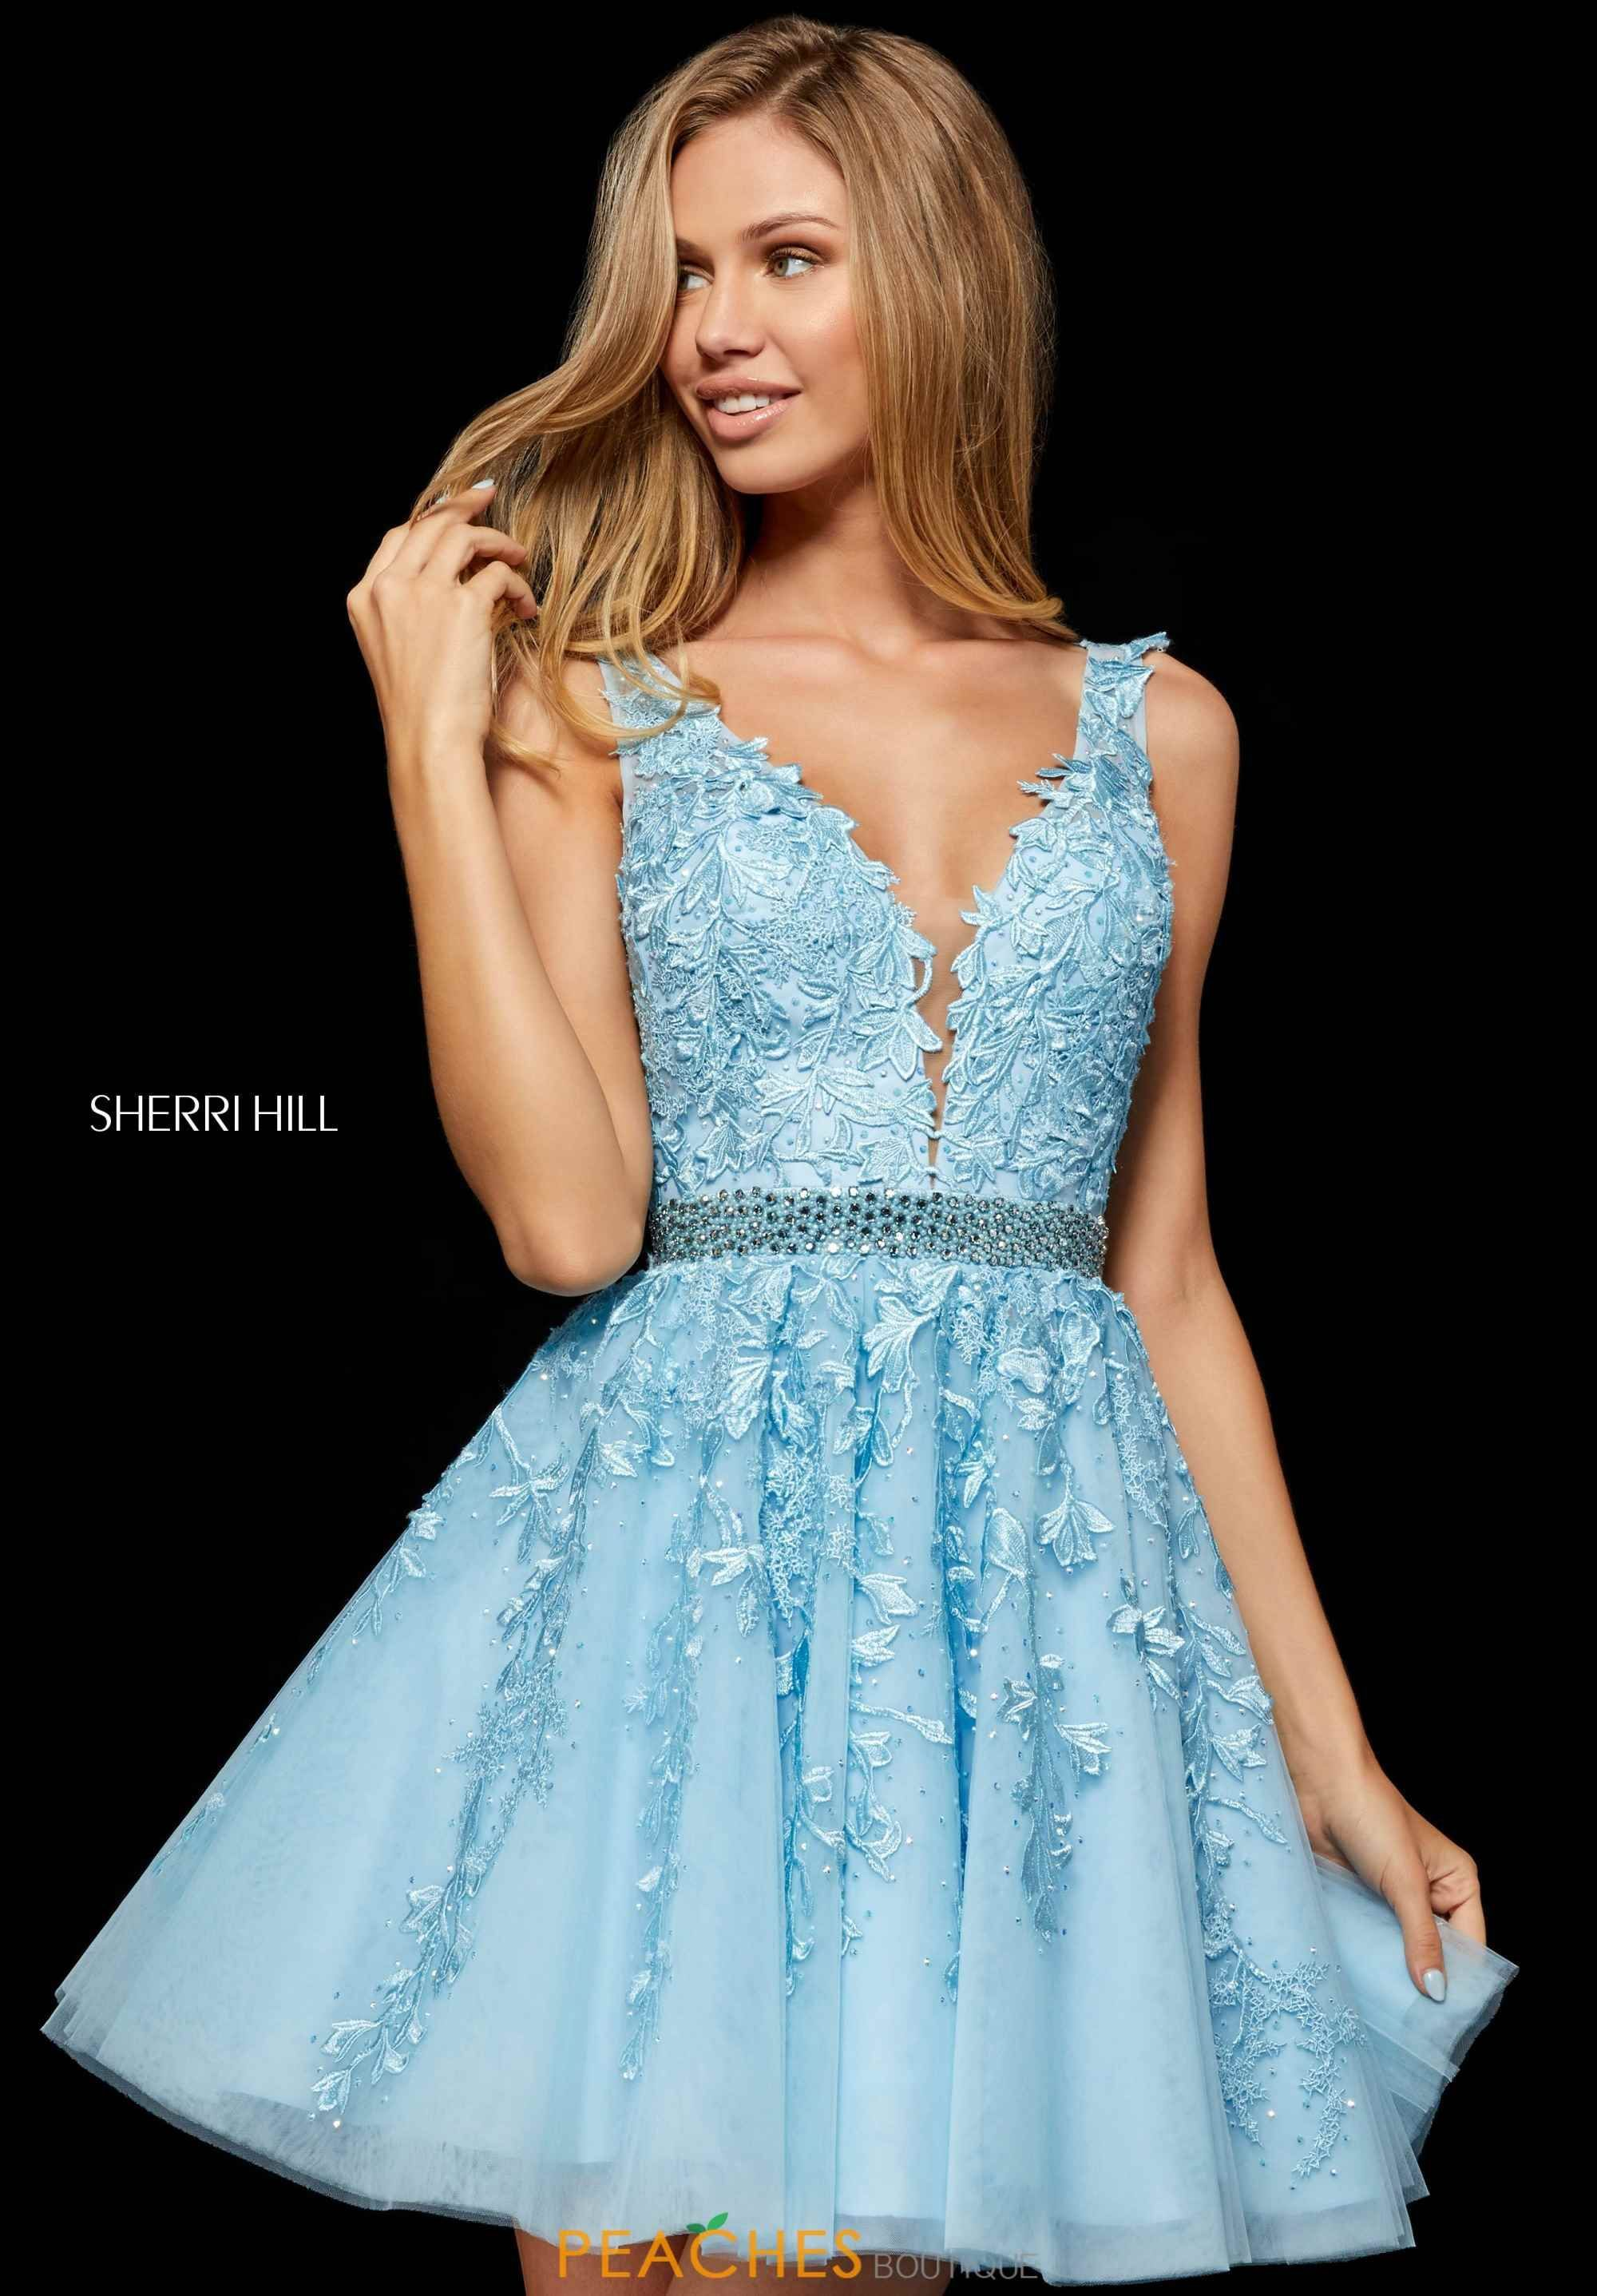 sherri hill short dress 52157 | peachesboutique, #dress